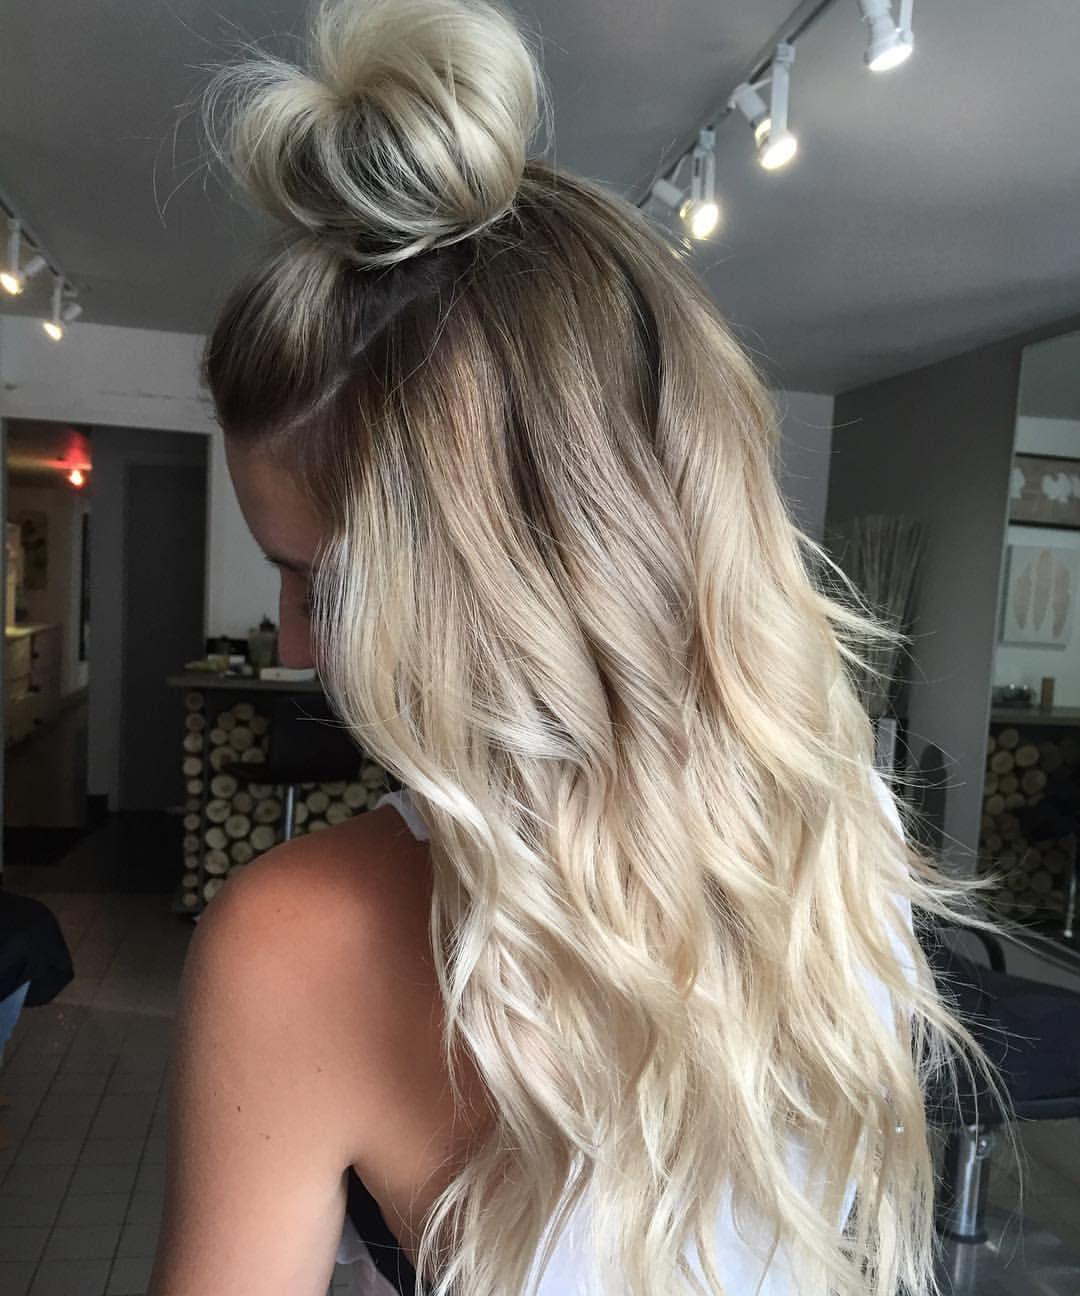 h bsche friseur haare kosmetik pinterest haar ideen blonde haare und frisuren. Black Bedroom Furniture Sets. Home Design Ideas